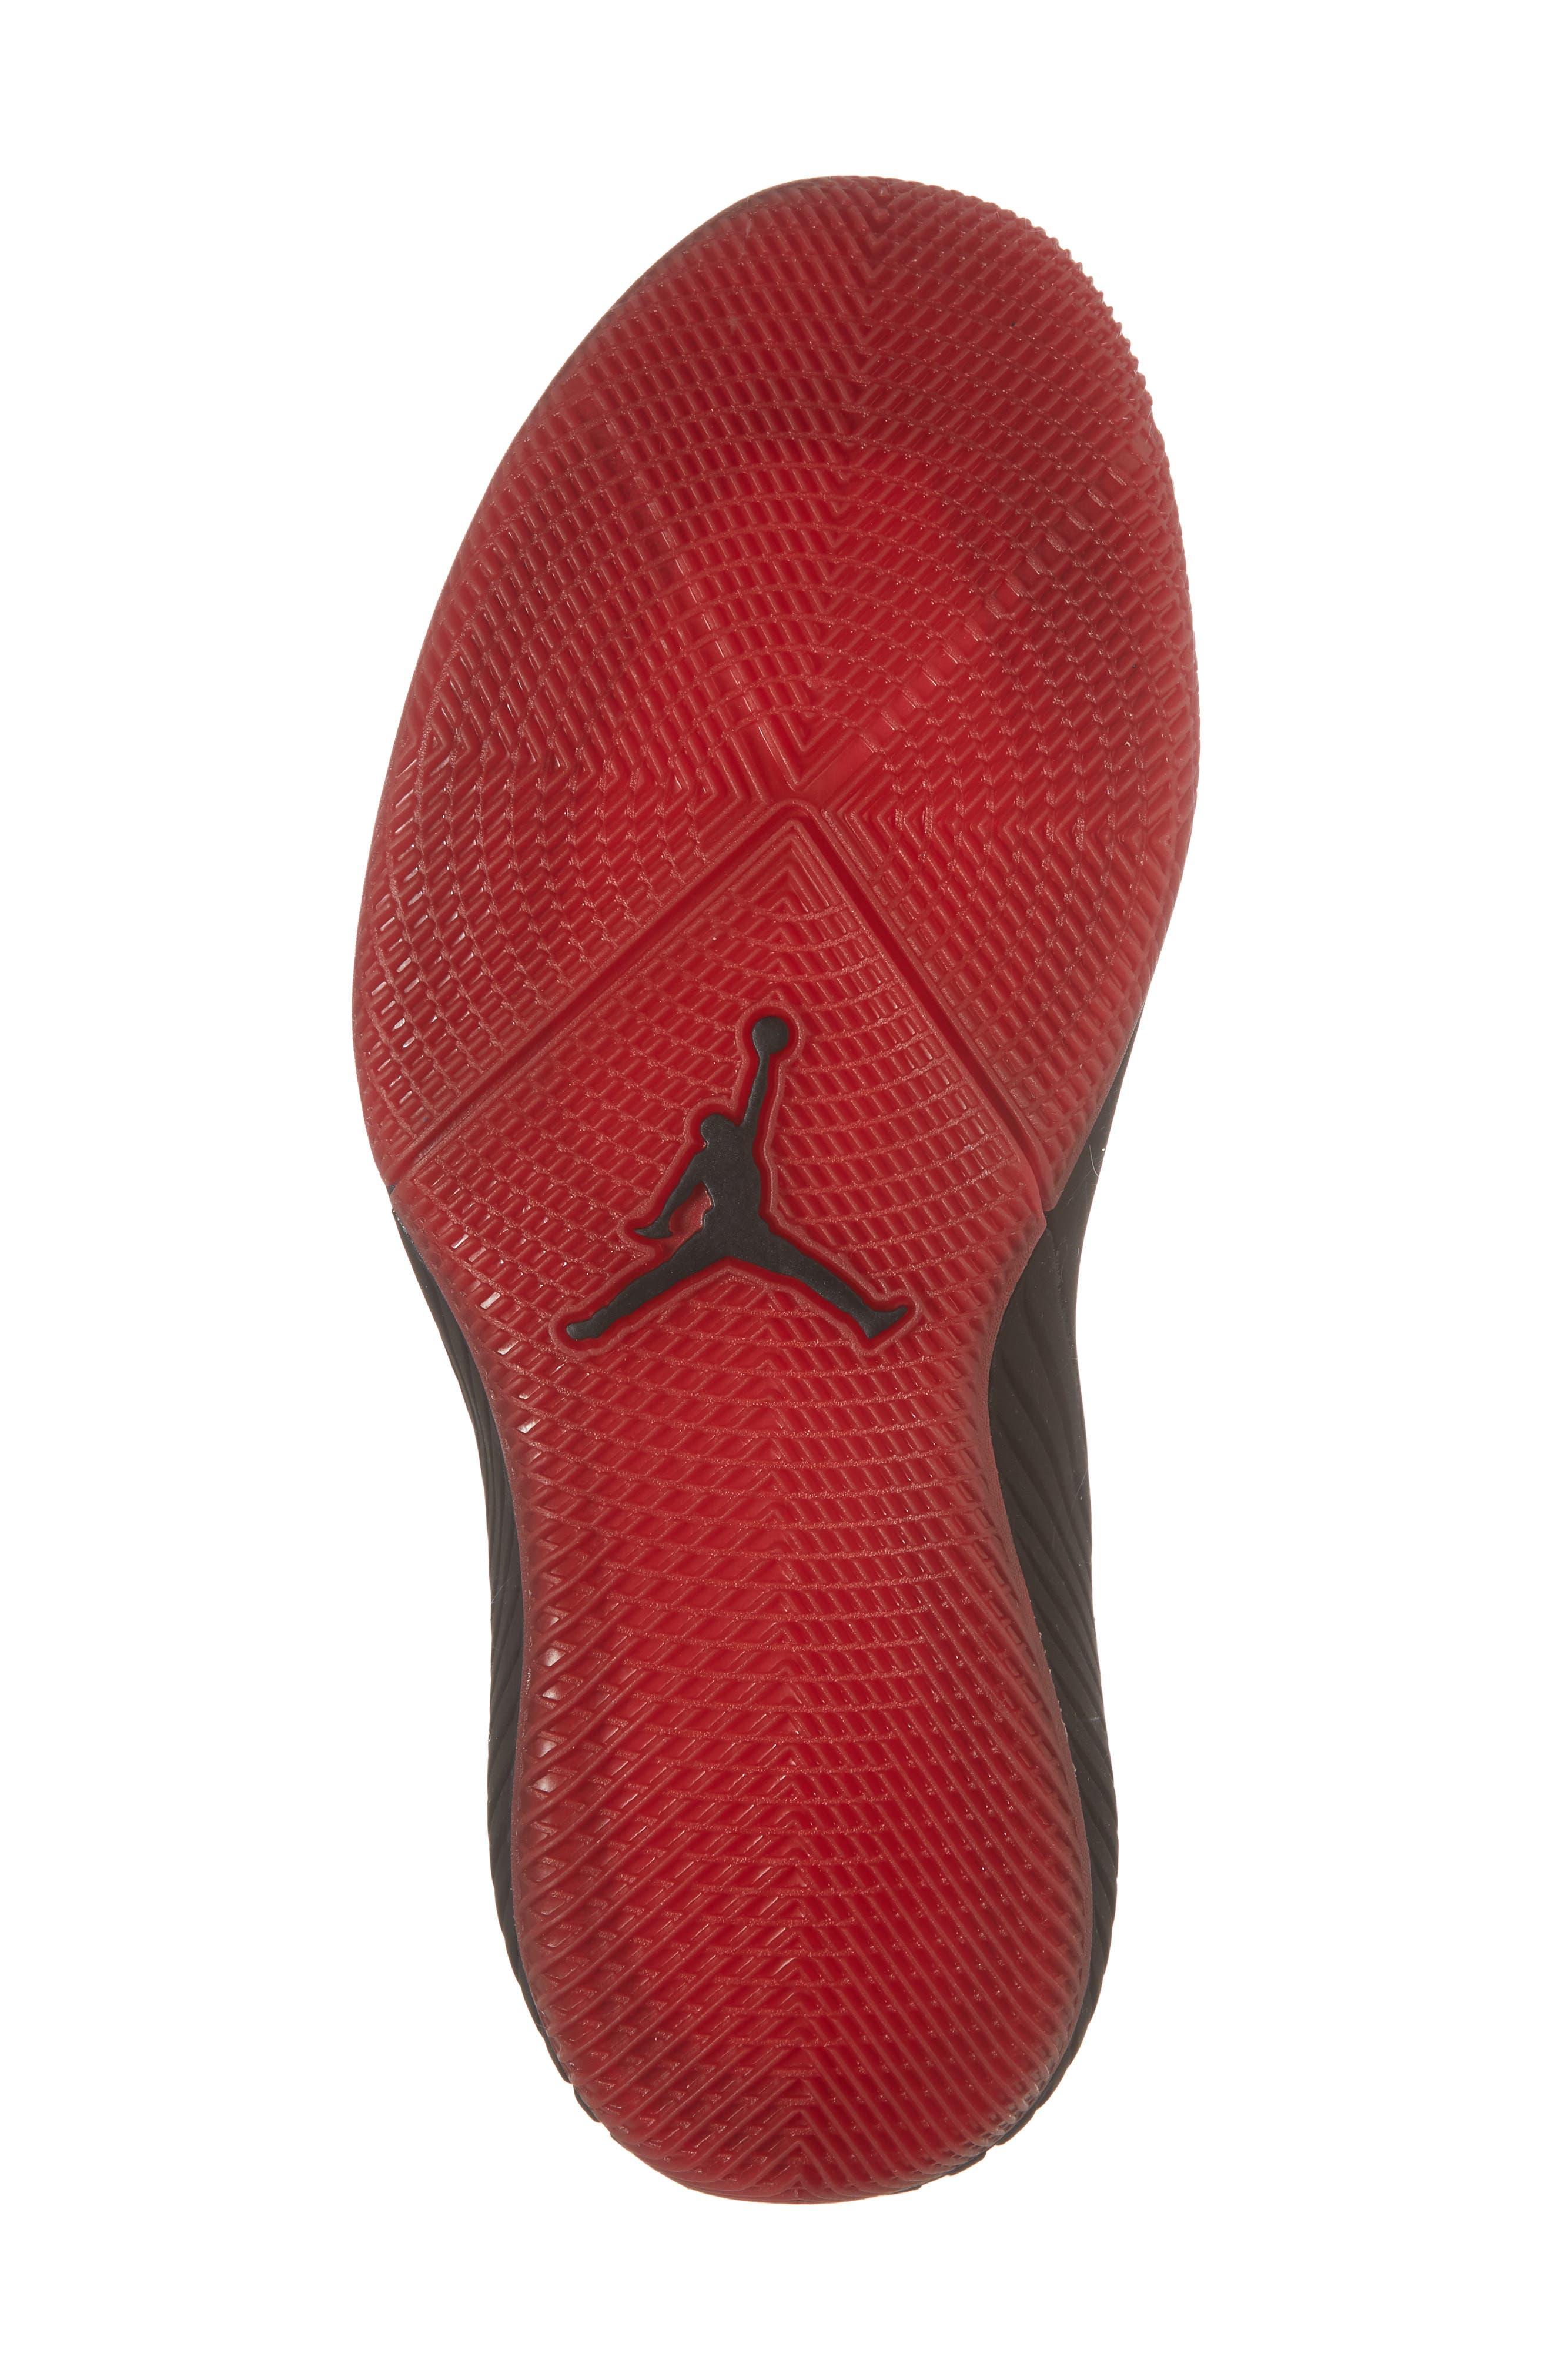 Jordan 'Why Not?' Zero.1 Basketball Shoe,                             Alternate thumbnail 6, color,                             Black/ Hyper Royal